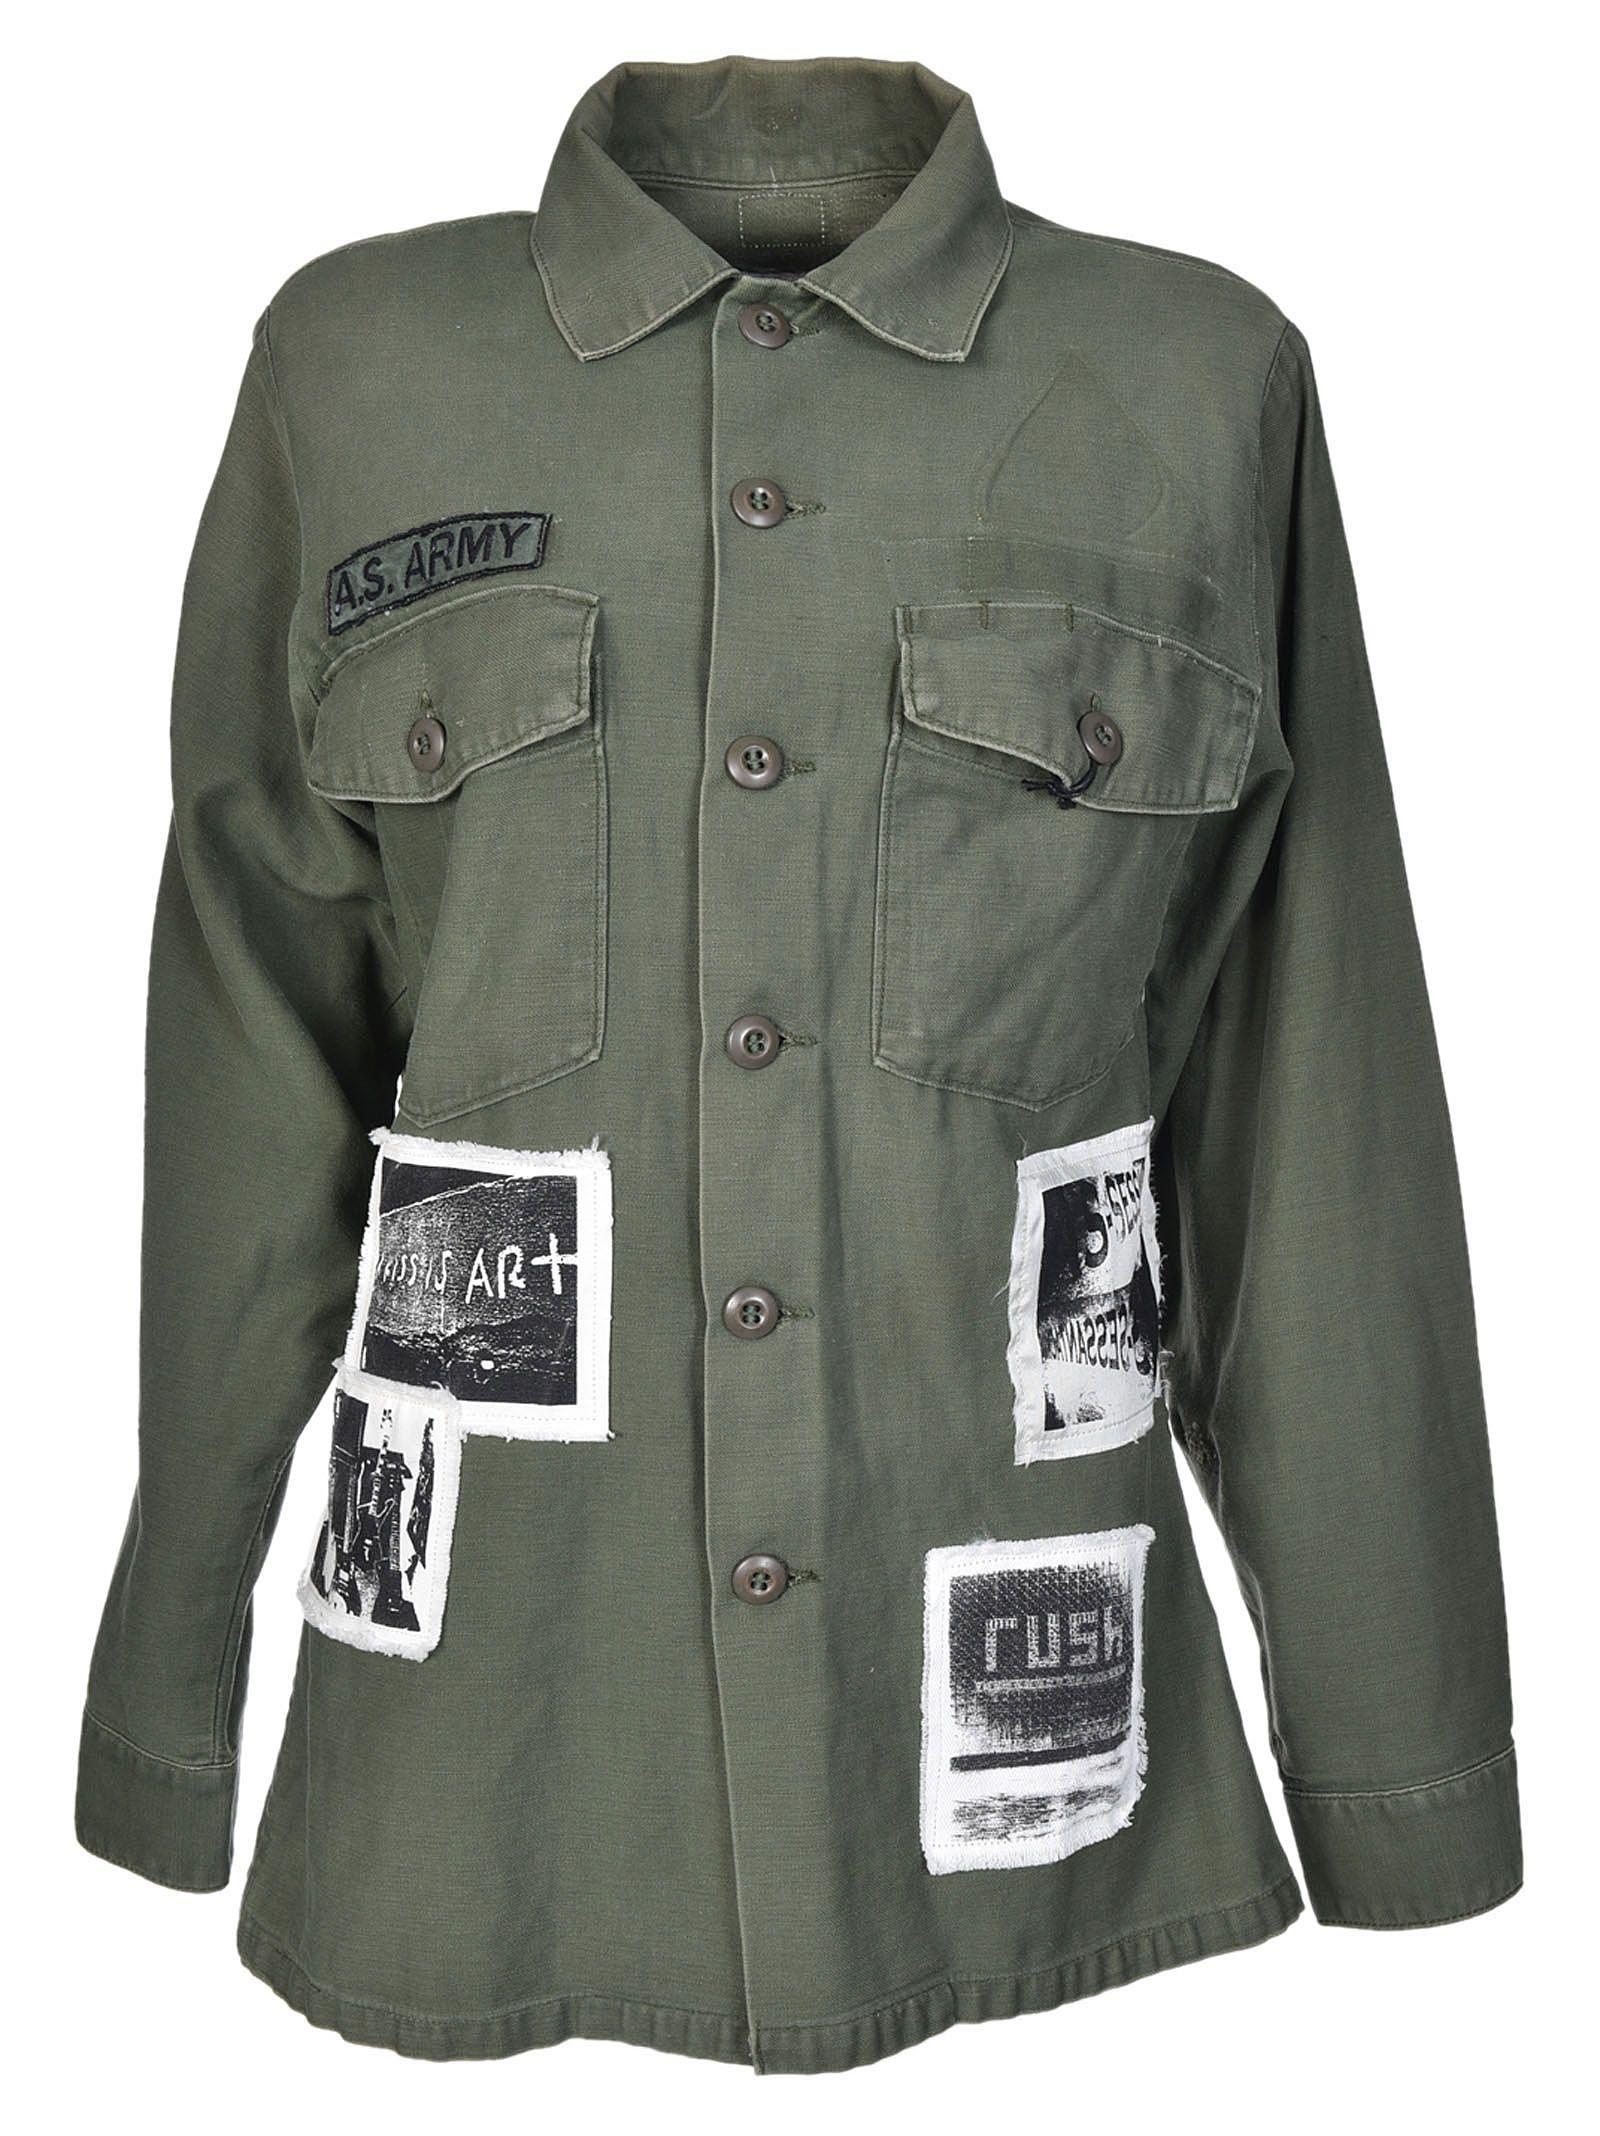 As65 Vintage Shirt